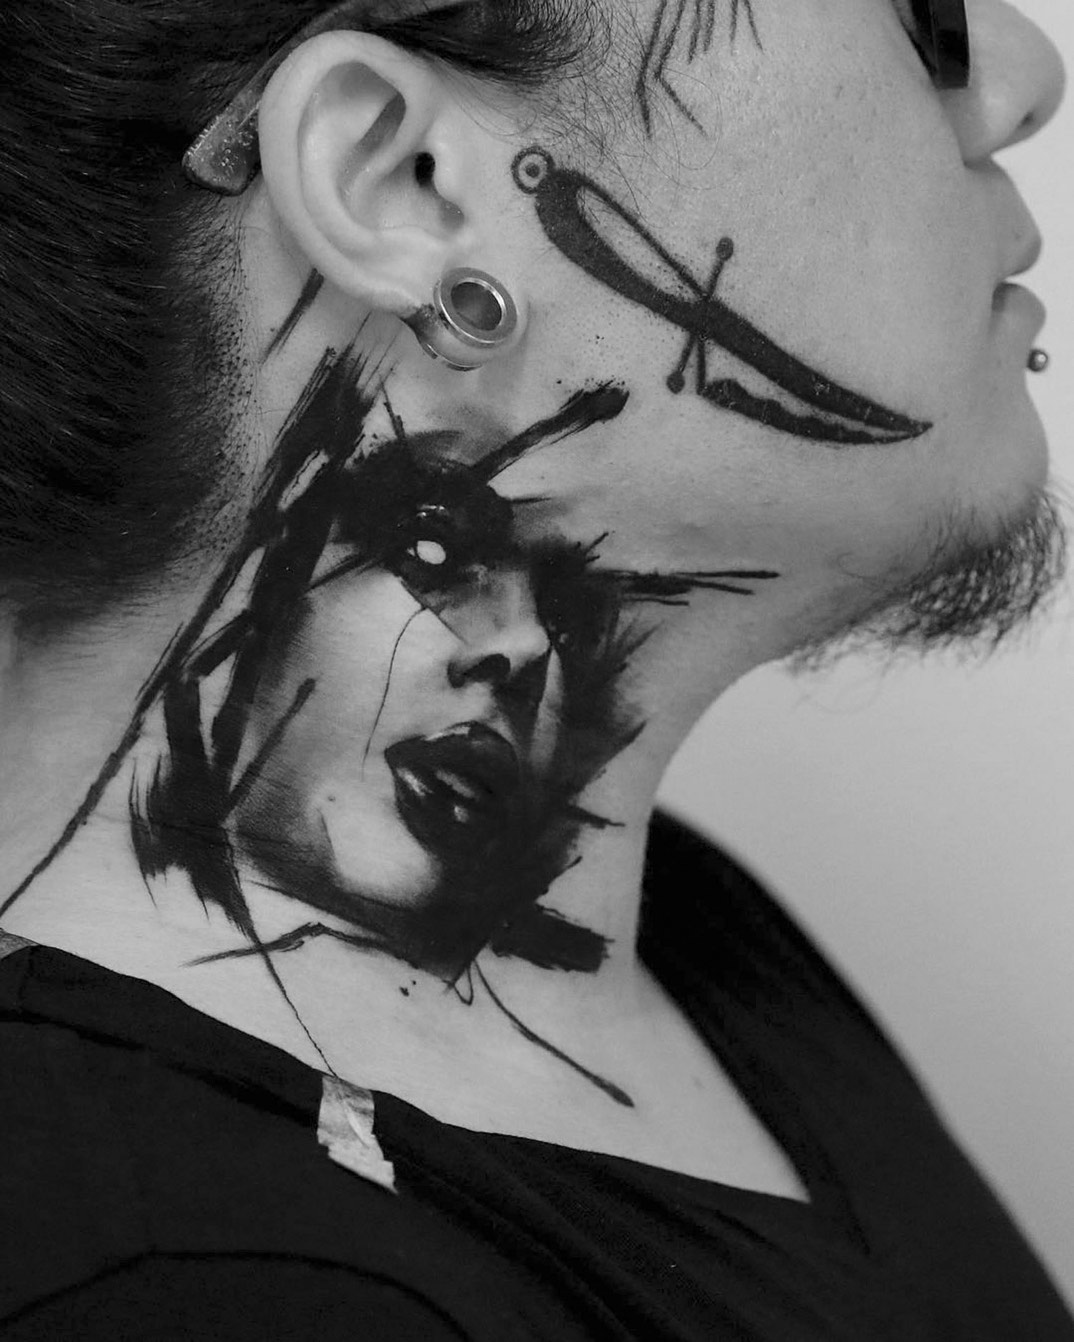 drammatici-ritratti-misteriosi-tatuaggi-monocromatici-kurt-staudinger-02